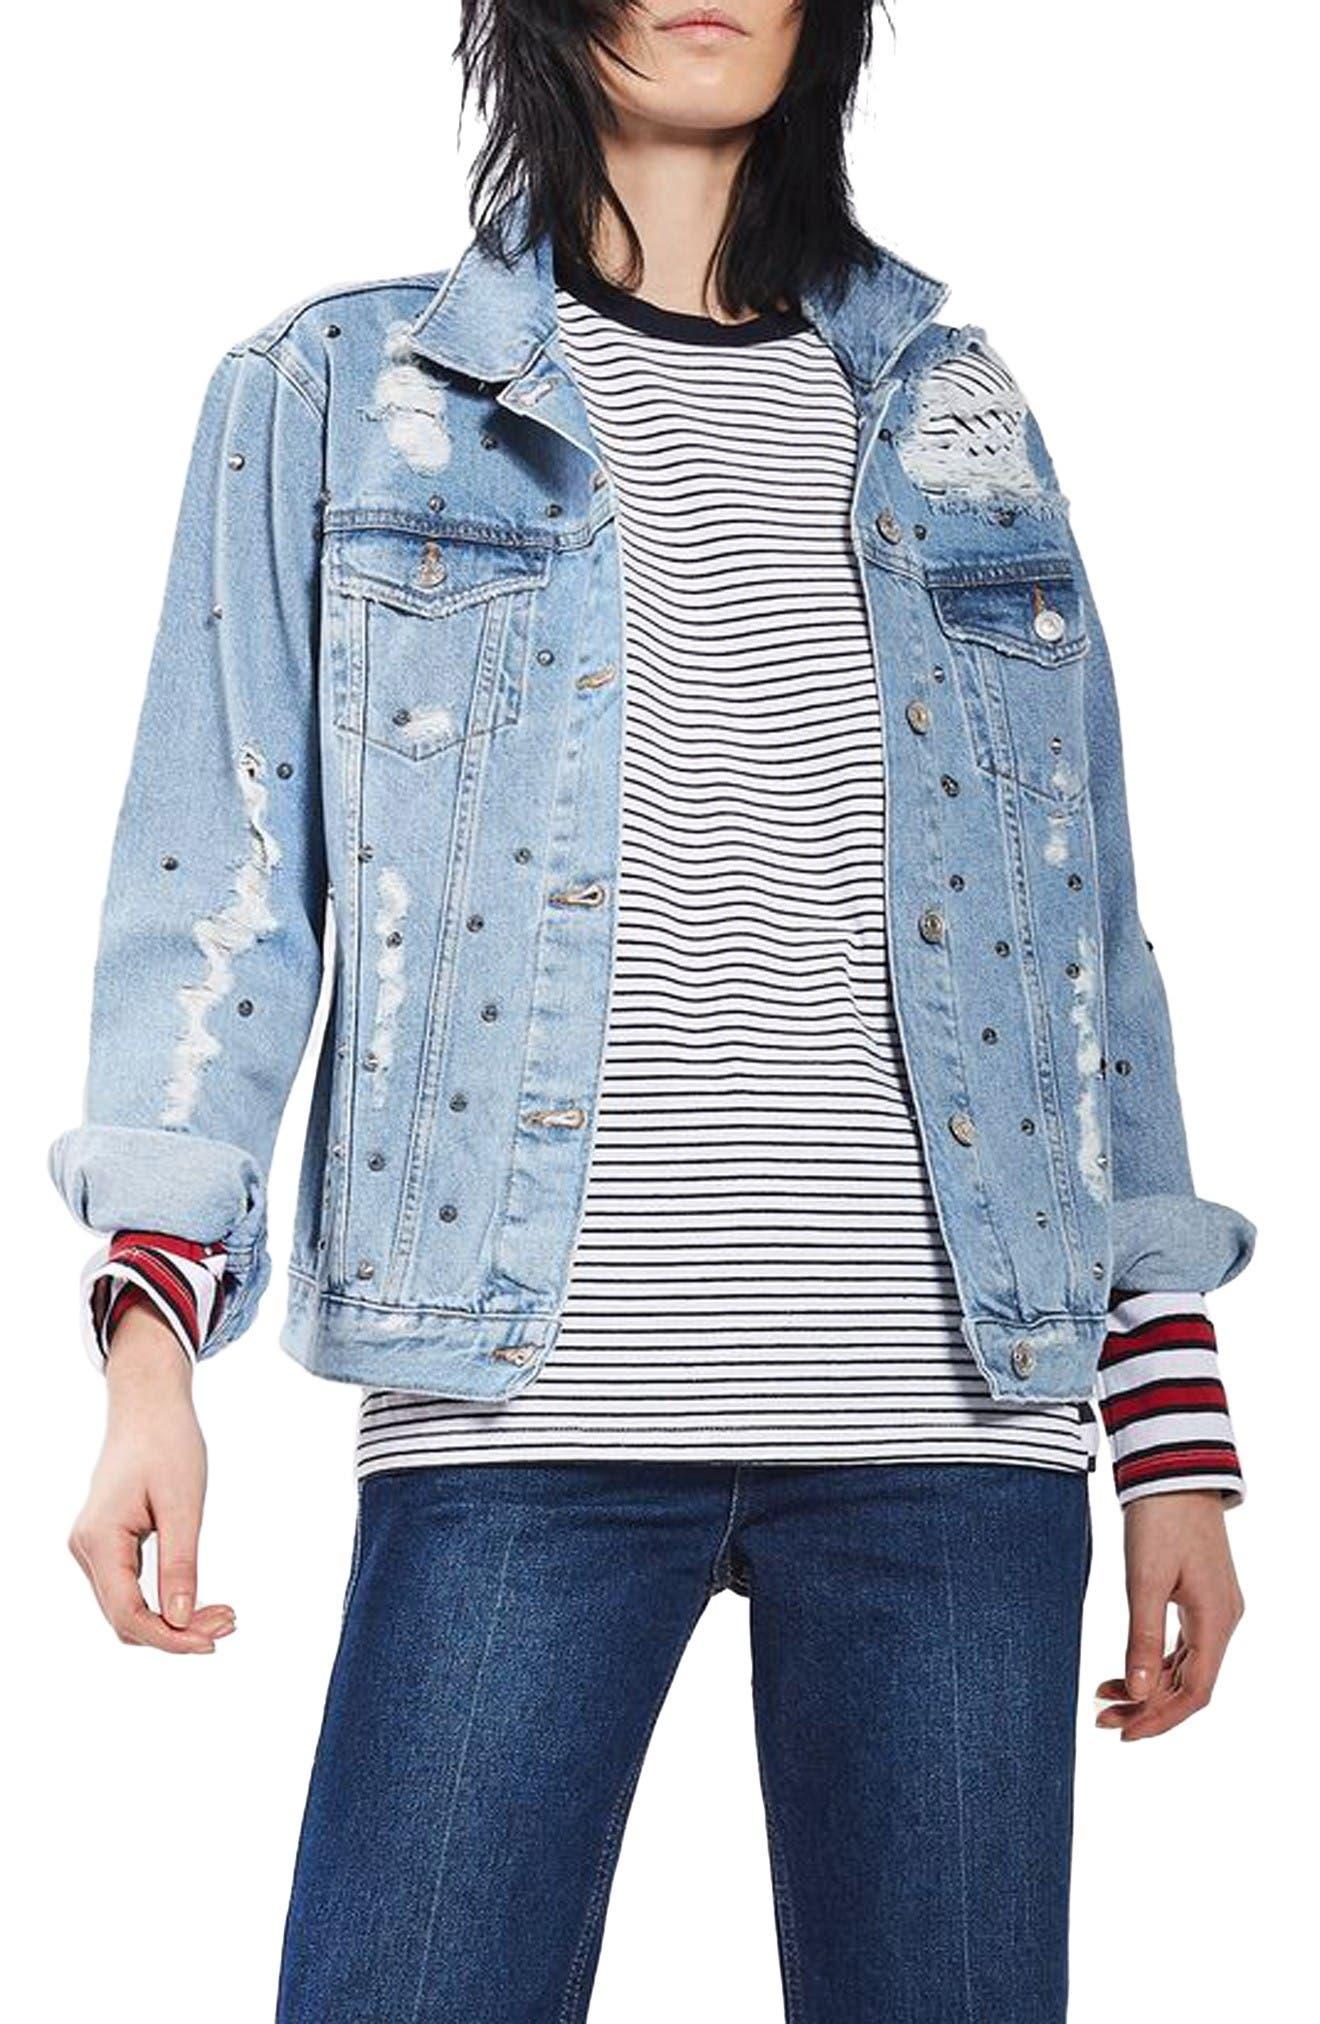 Main Image - Topshop Studded Distressed Denim Jacket (Regular & Petite)